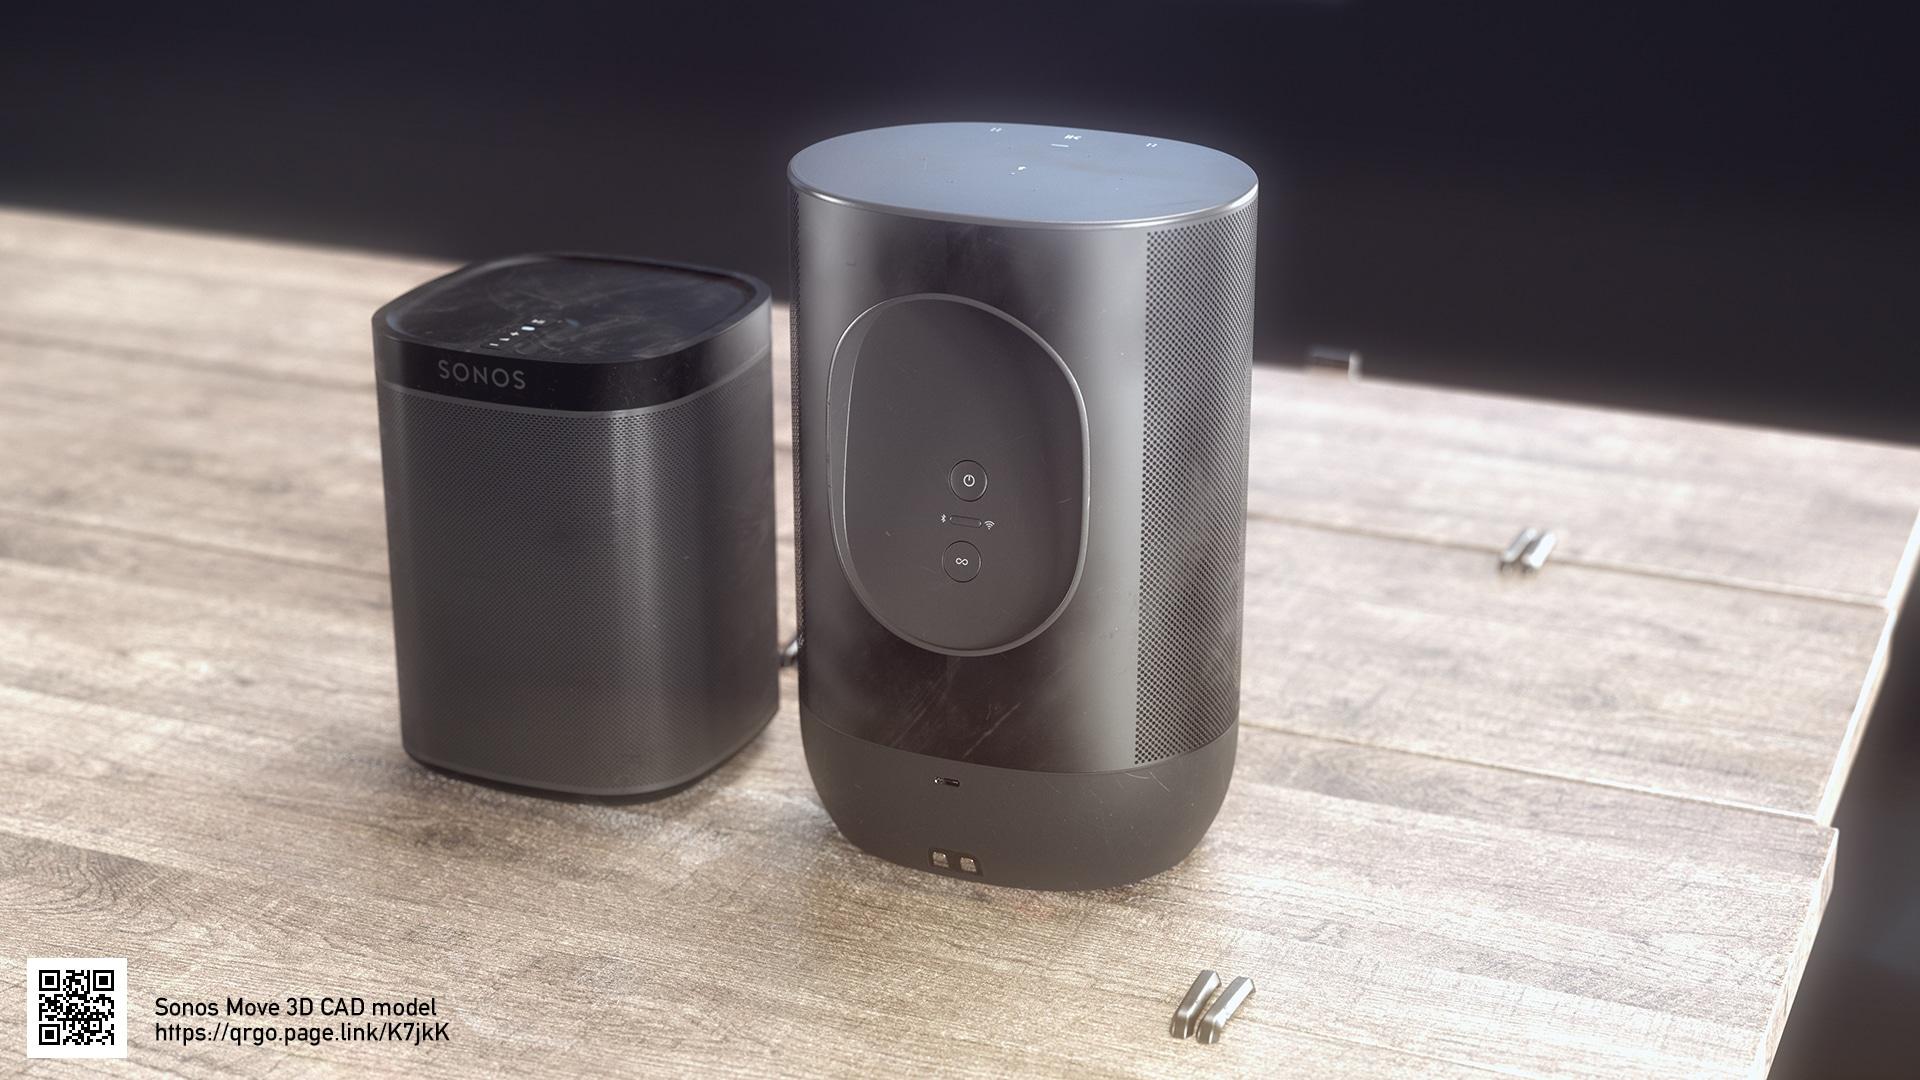 Sonos Move - 3D CAD model